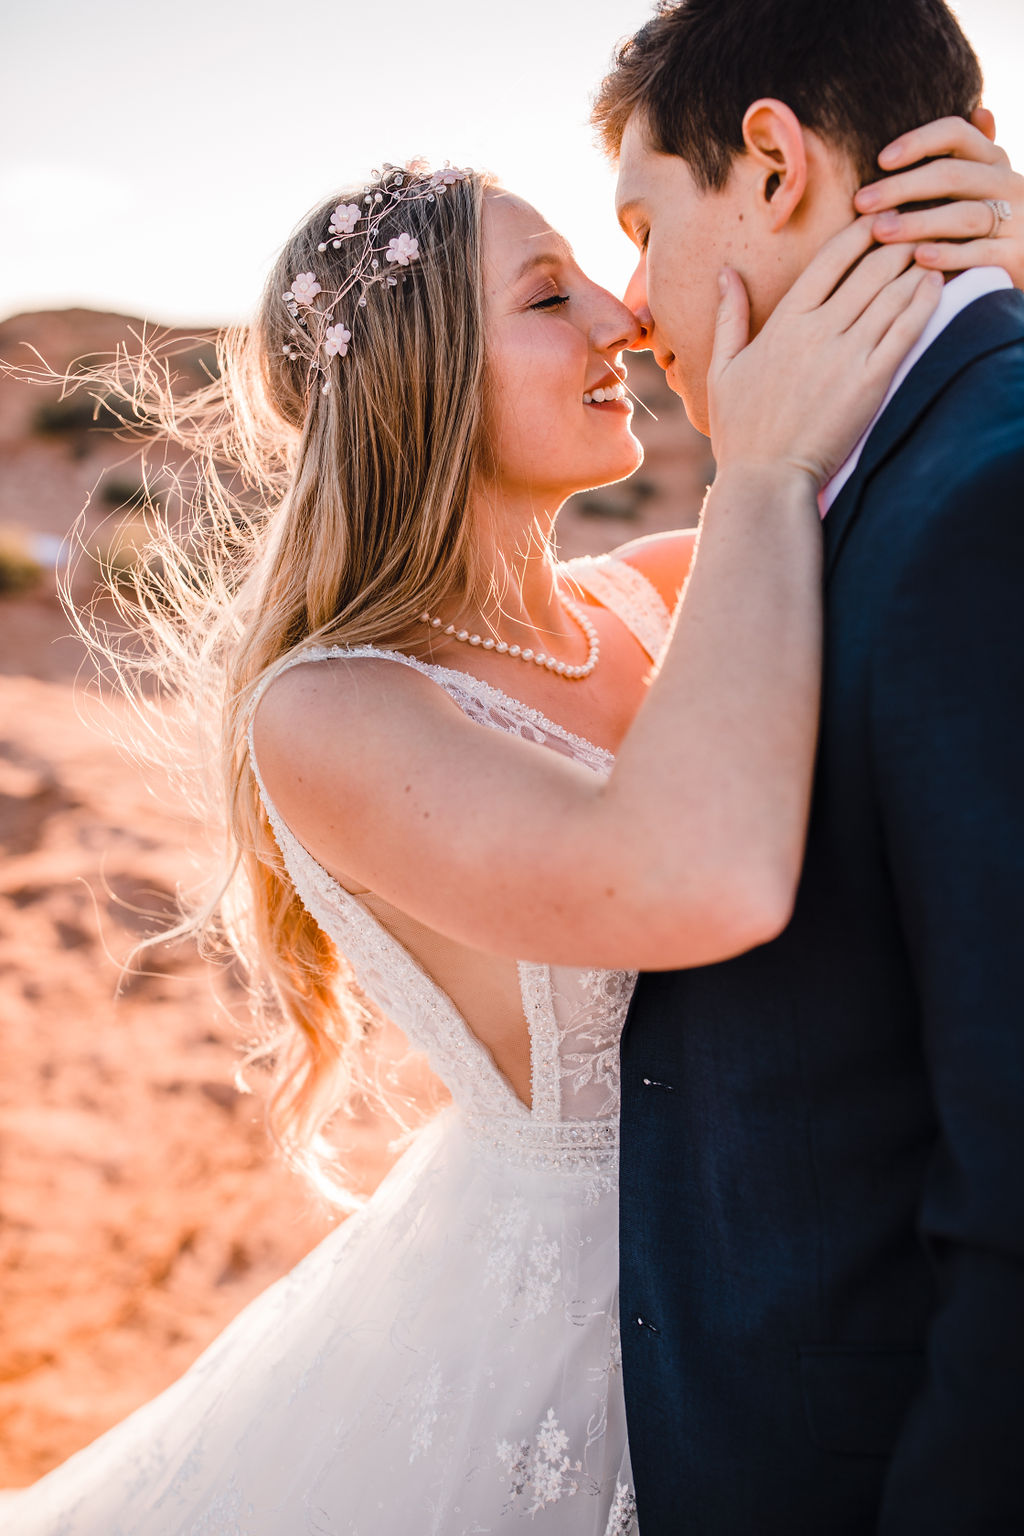 page arizona formal photographer best white dainty floral crown bohemian bride lace wedding dress kissing romantic